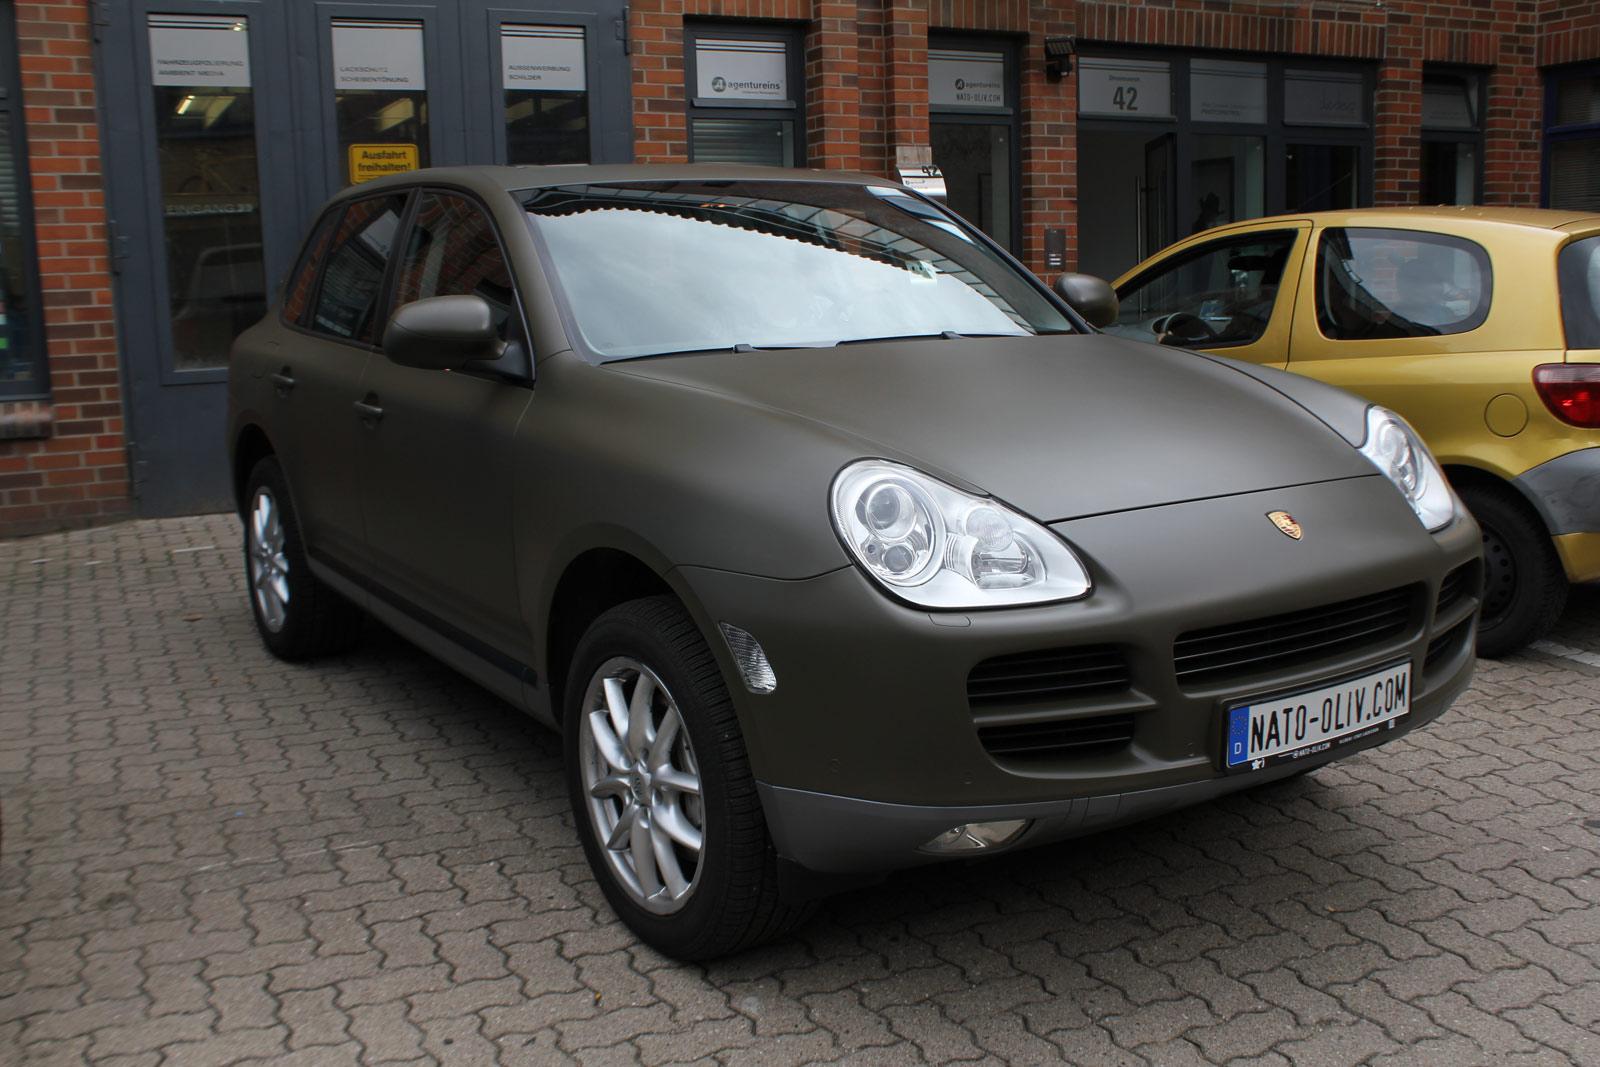 Porsche_Cayenne_Folierung_Nato-Oliv_Matt_09